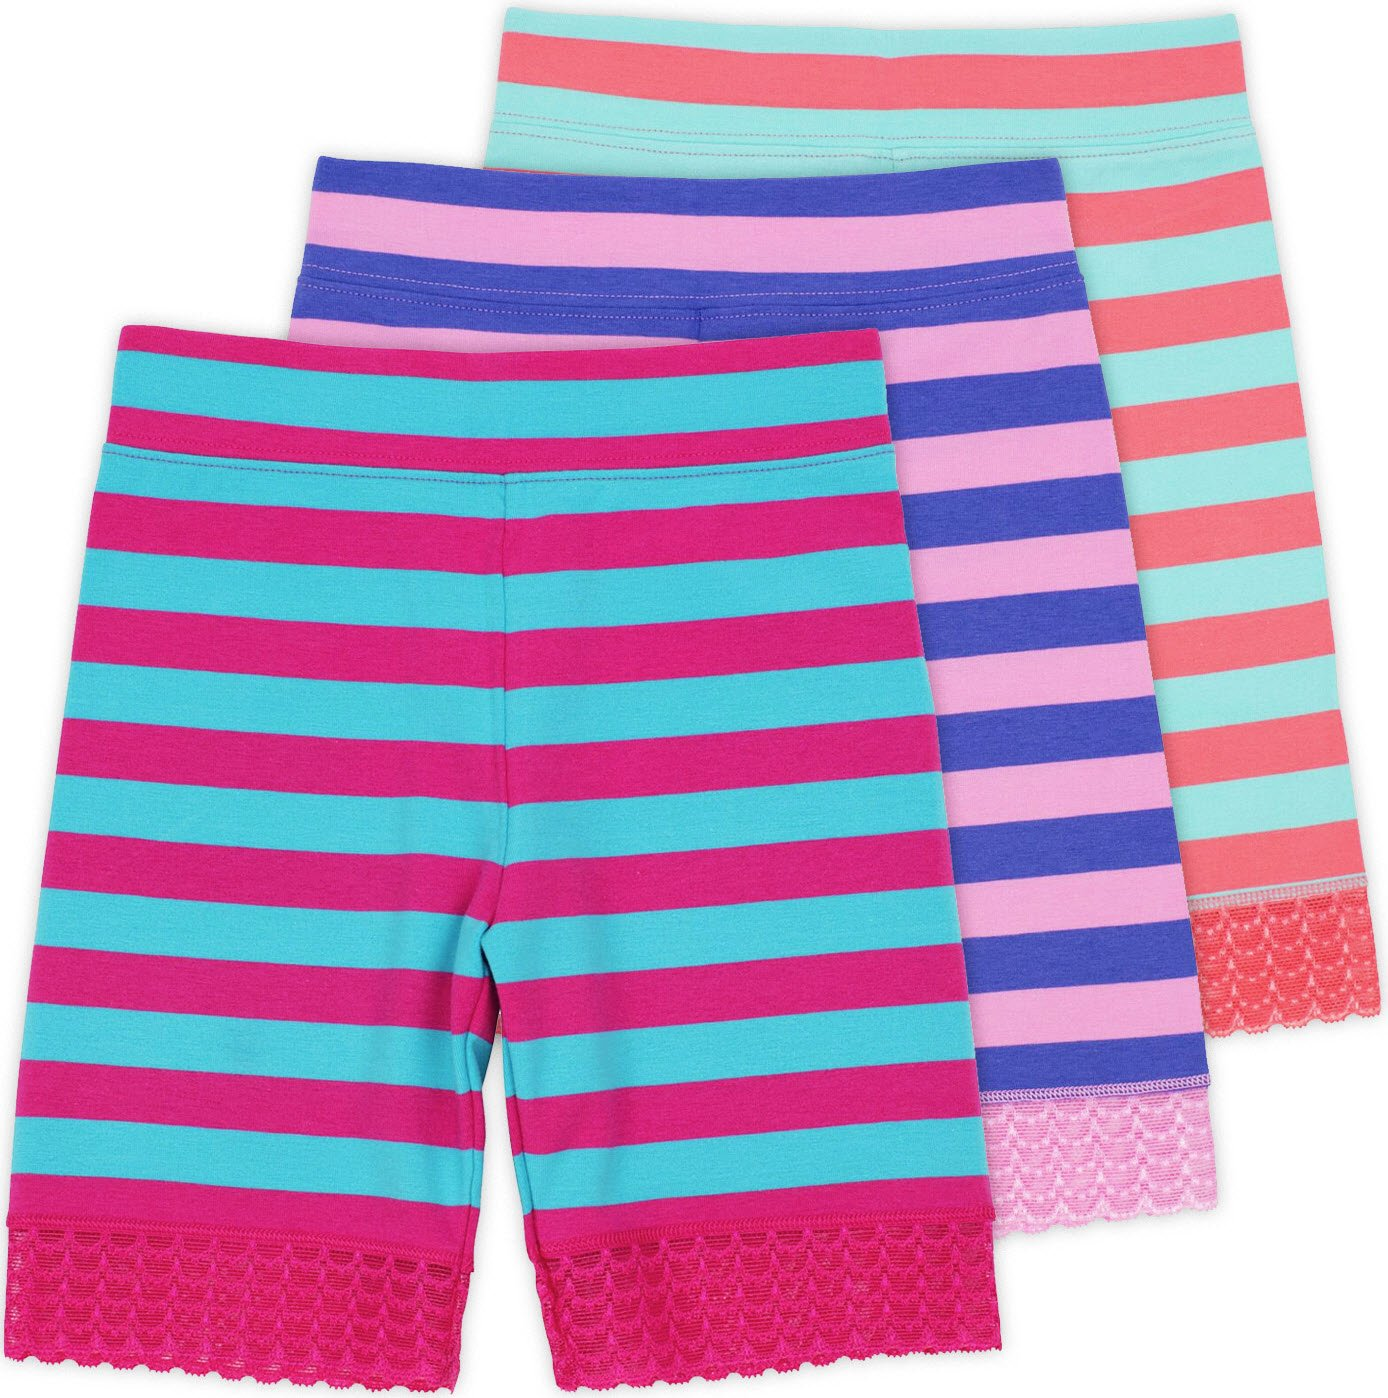 Lucky & Me Jada Little Girls Bike Shorts, Tagless, Soft Cotton, Lace Trim, Underwear, Striped 3 Pack, 6